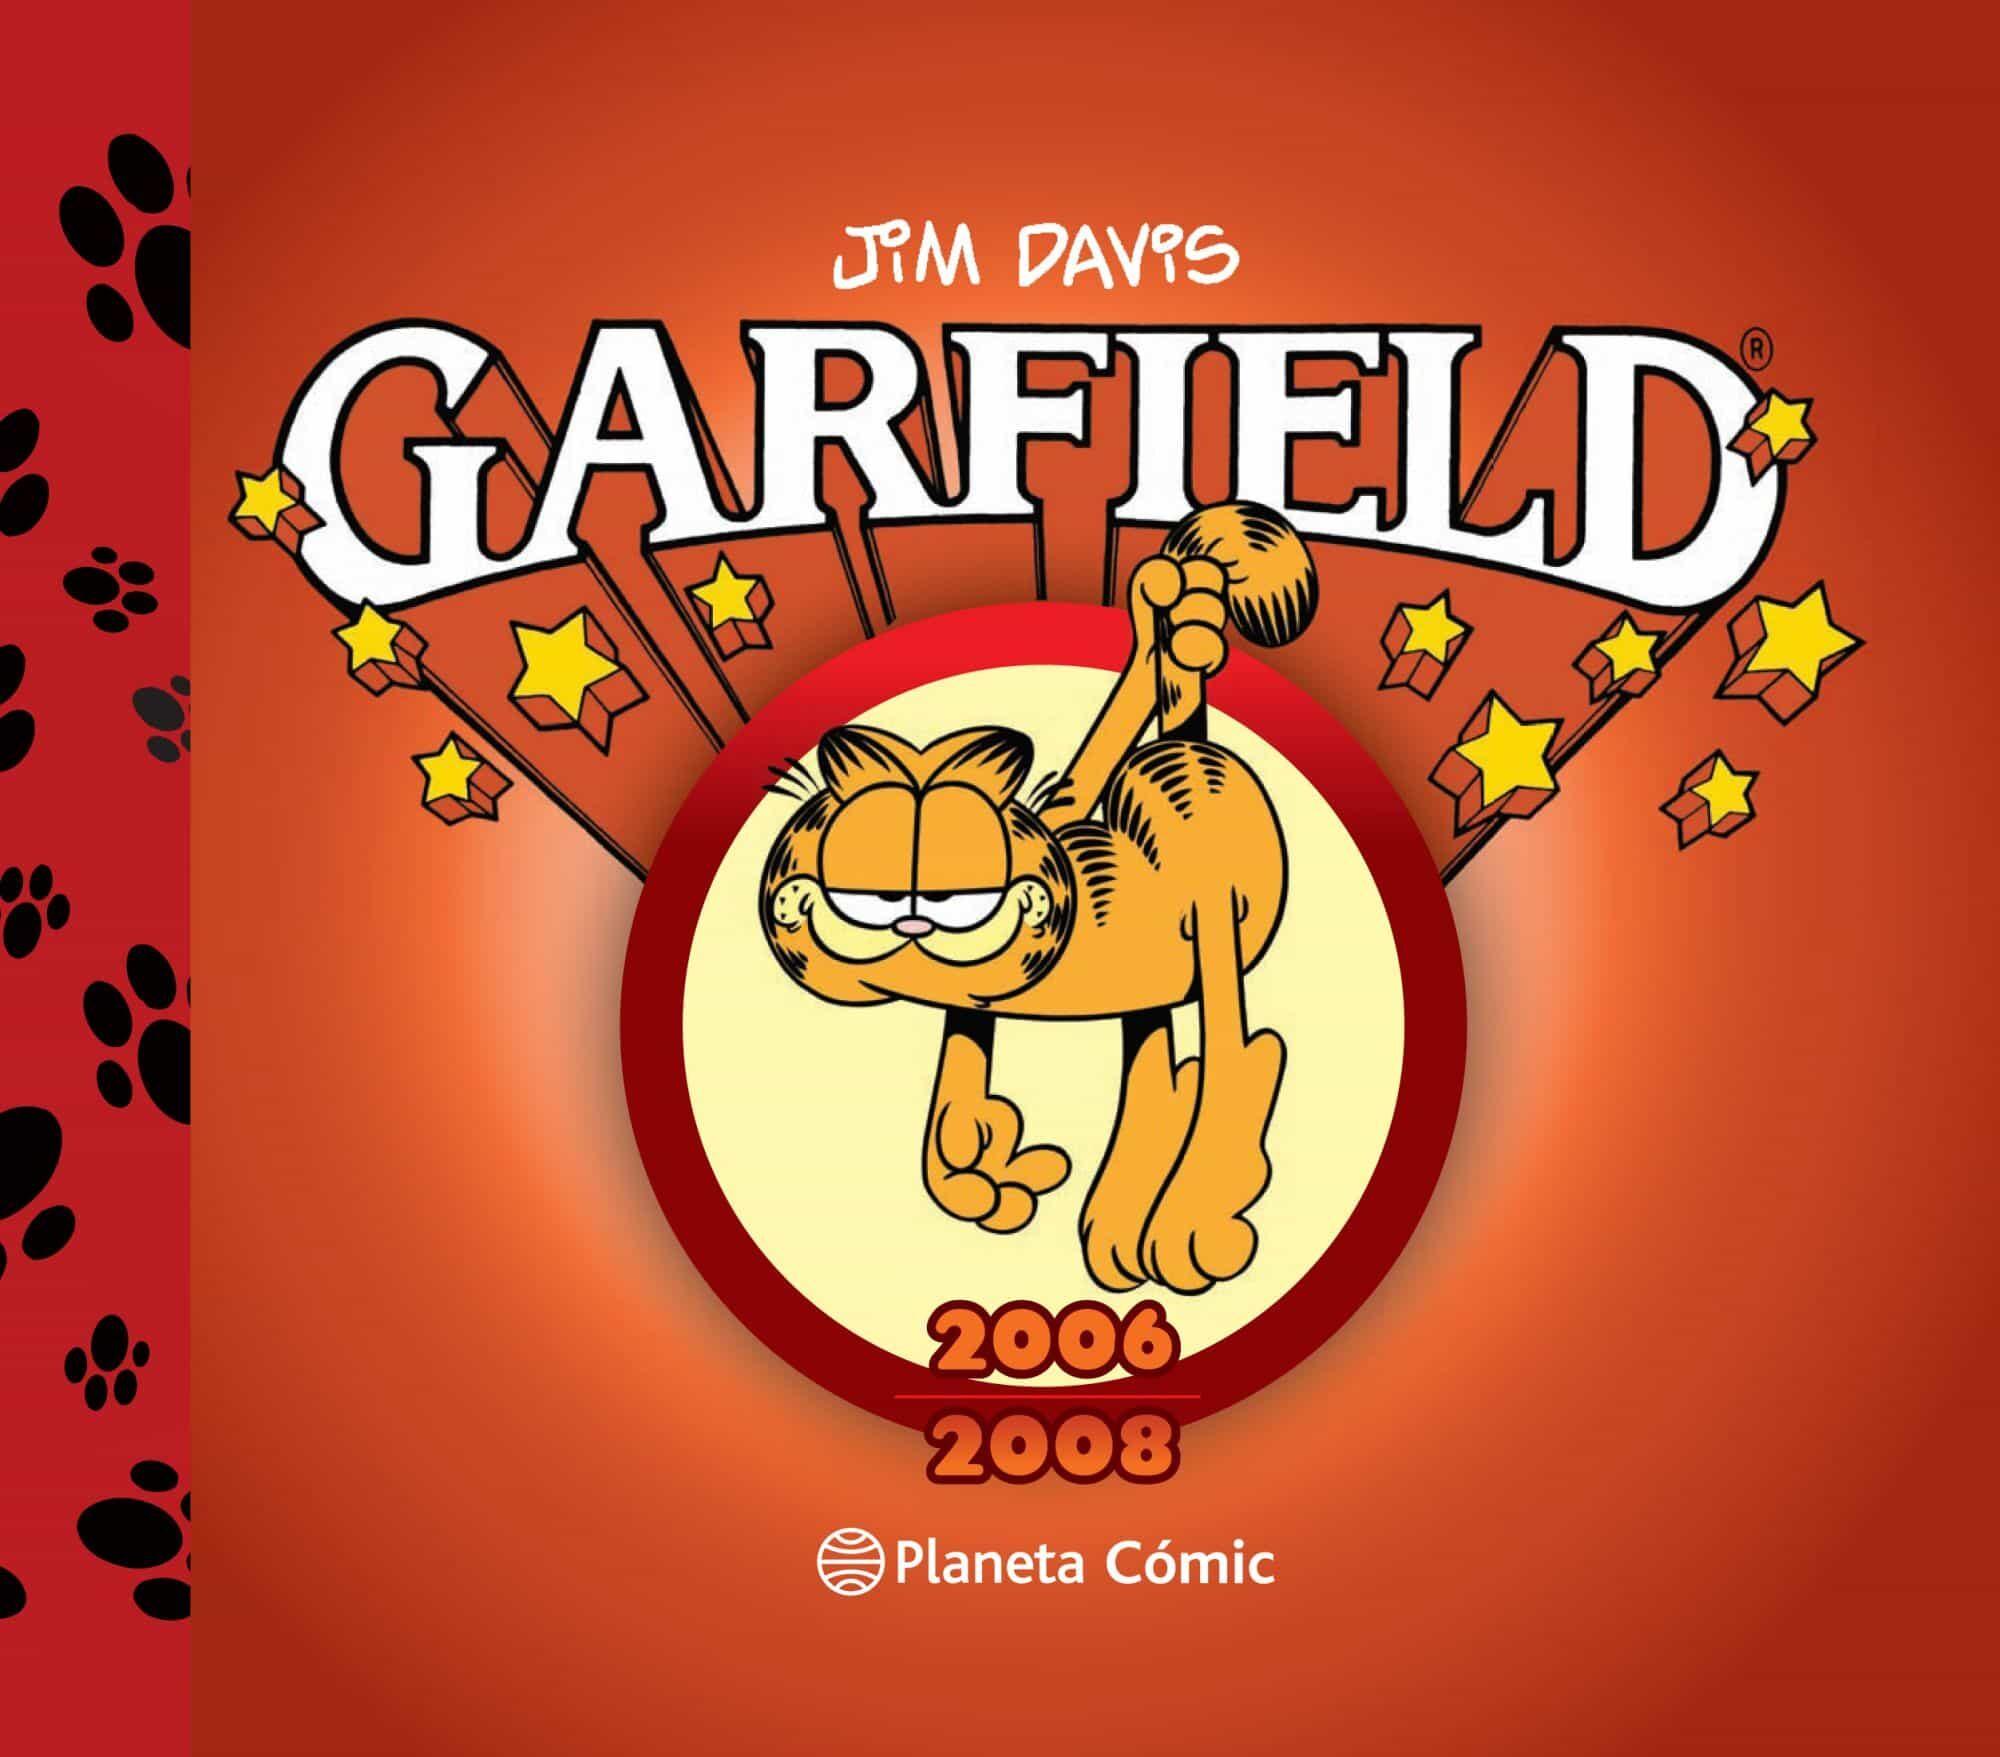 garfield 15-jim davis-9788468480497